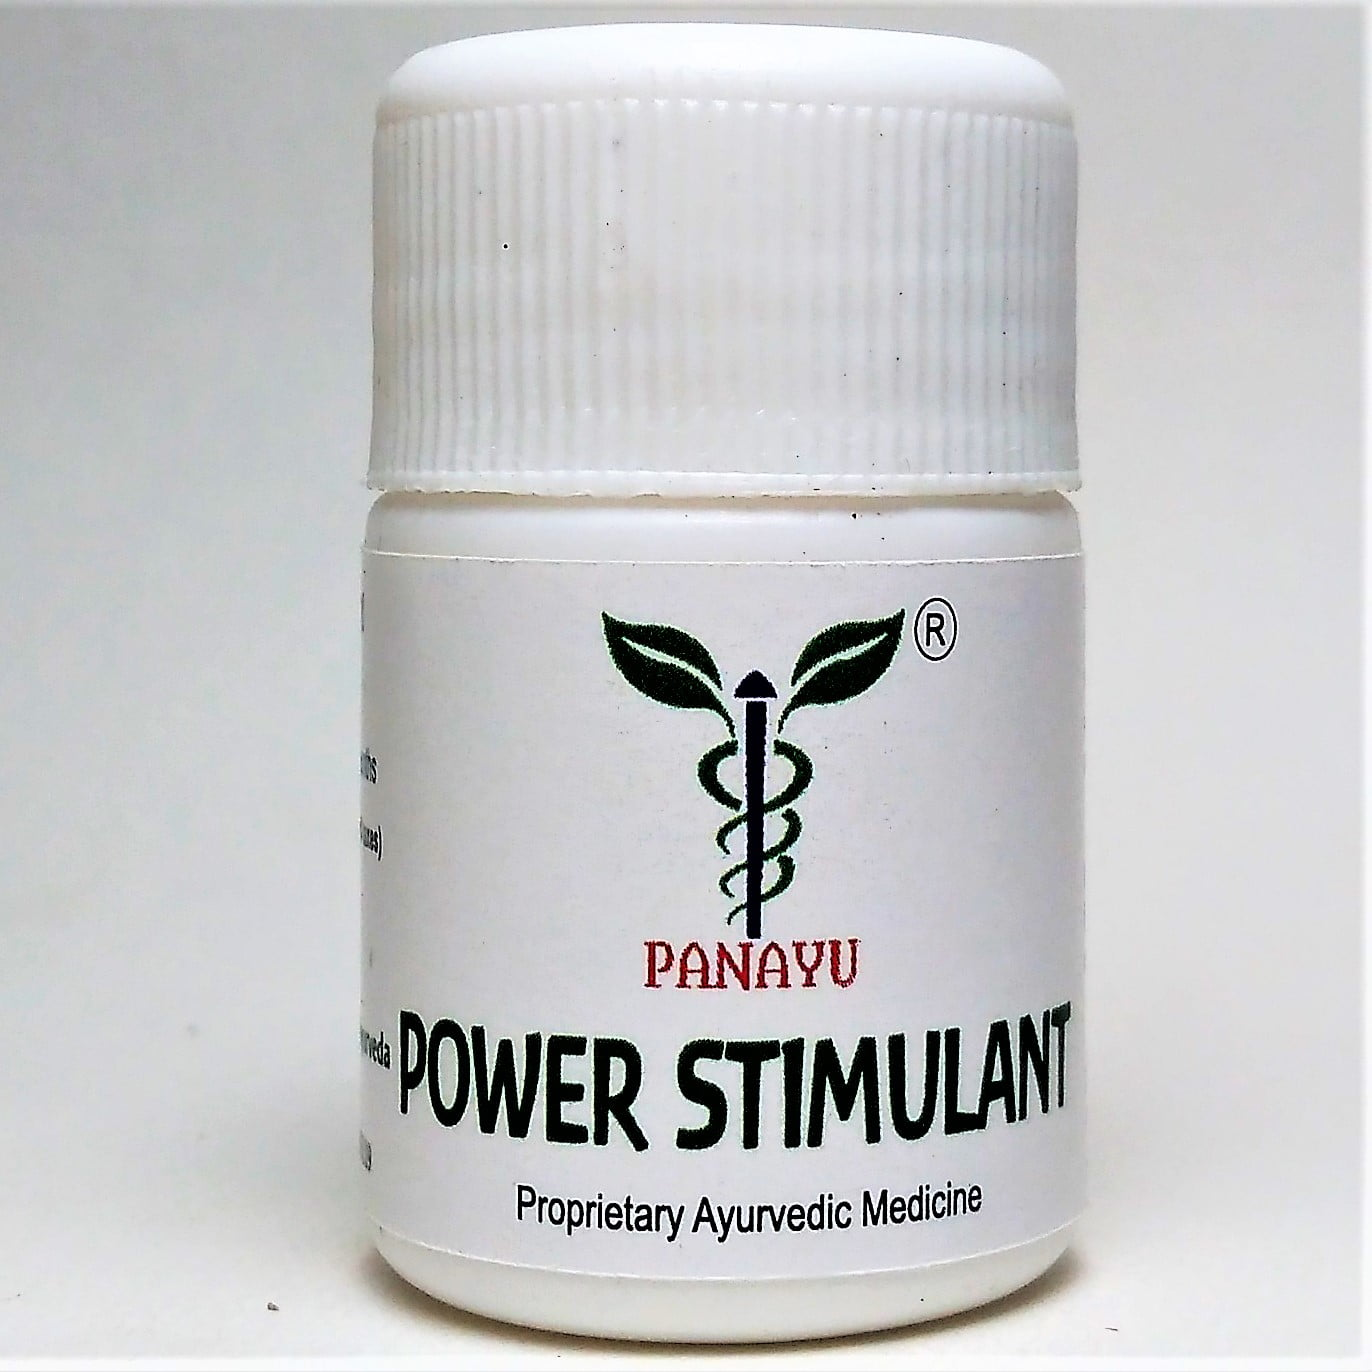 Panayu Power Stimulant 1